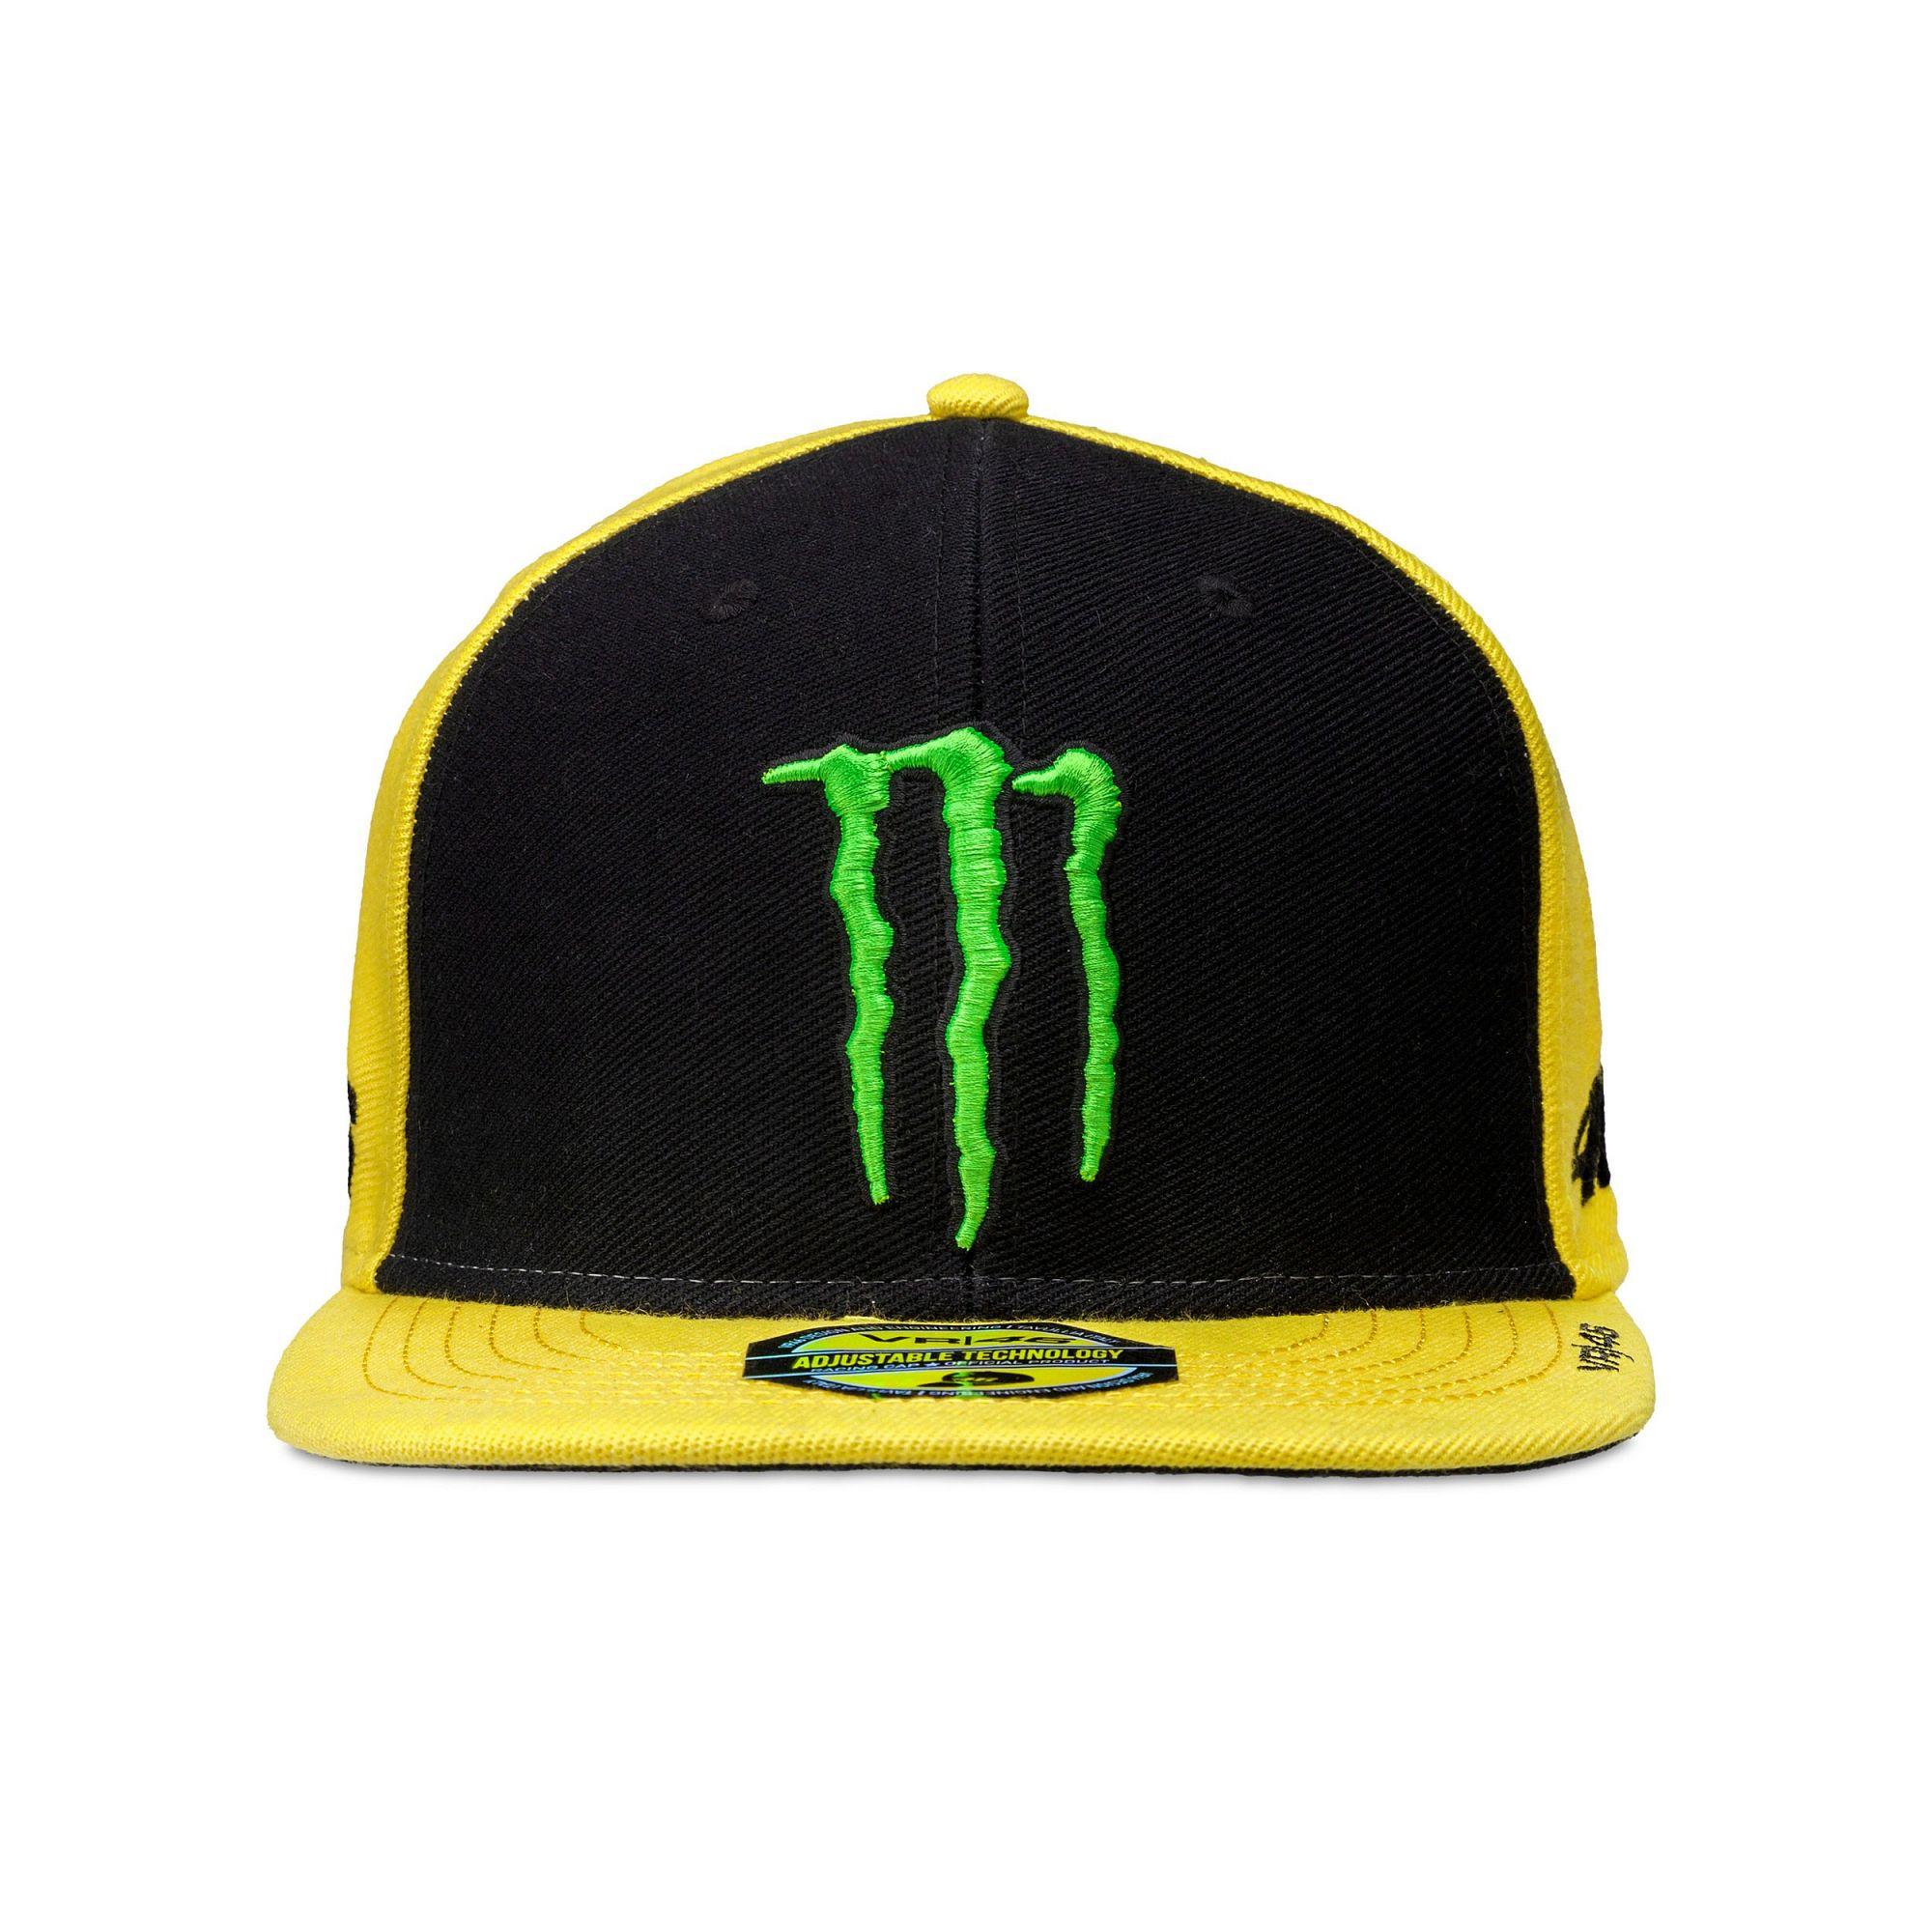 d016c85ce296d Gorra Valentino Rossi Monster amarilla 2017 en Motorbike Store